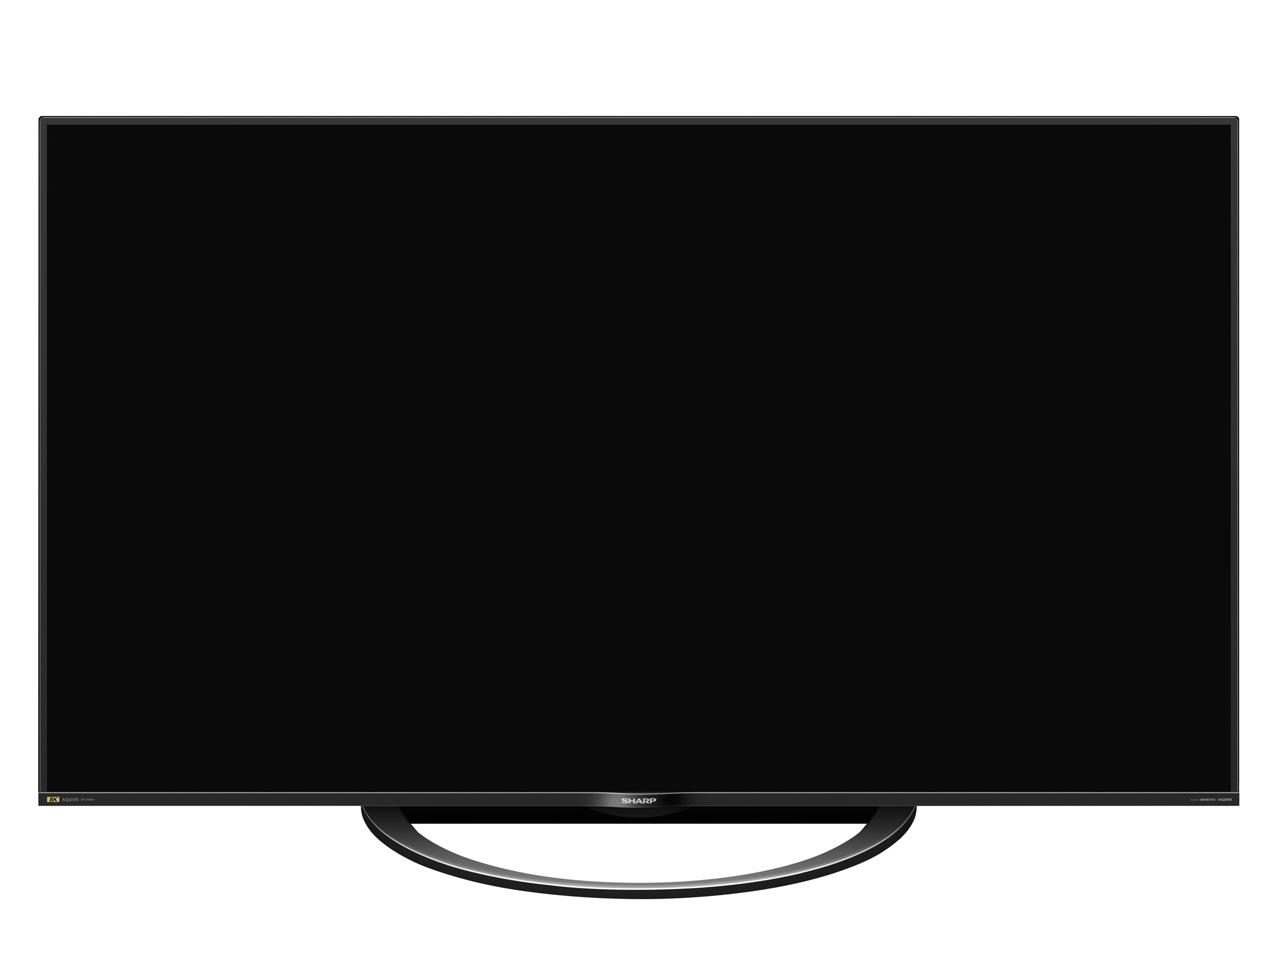 AQUOS 8T-C70AX1 [70インチ] の製品画像